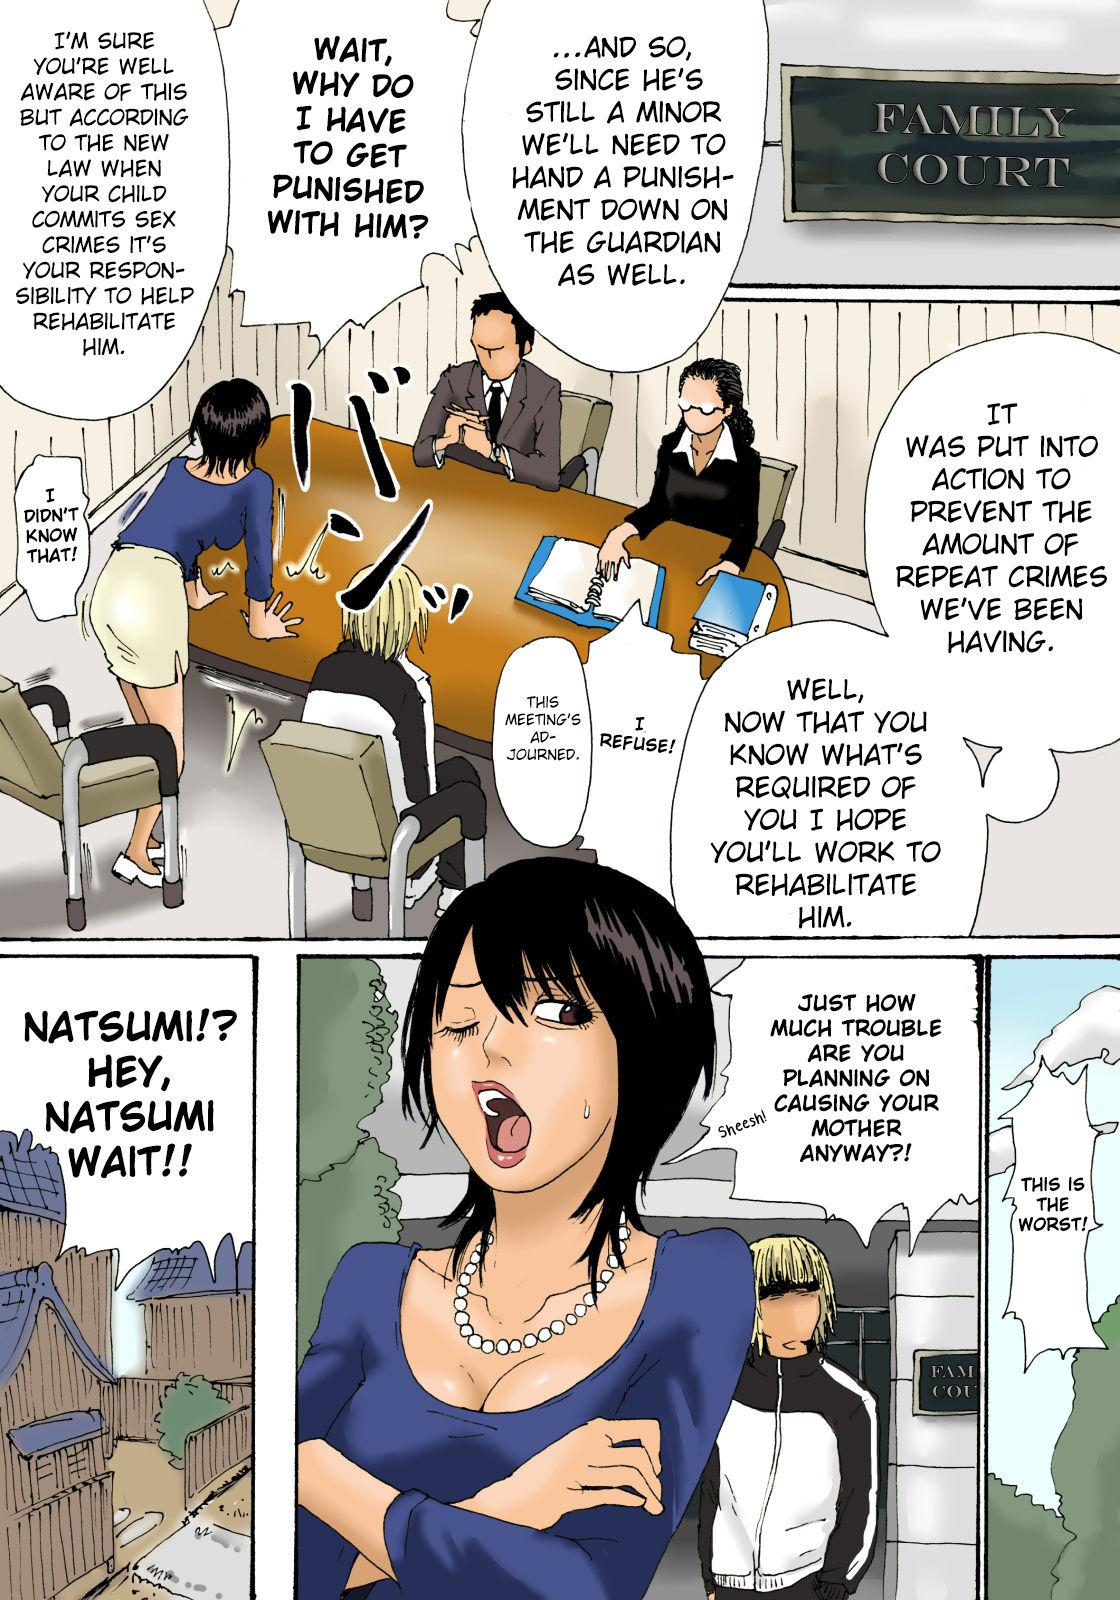 Hogosha Kanshobun | Guardian Rape Punishment 1